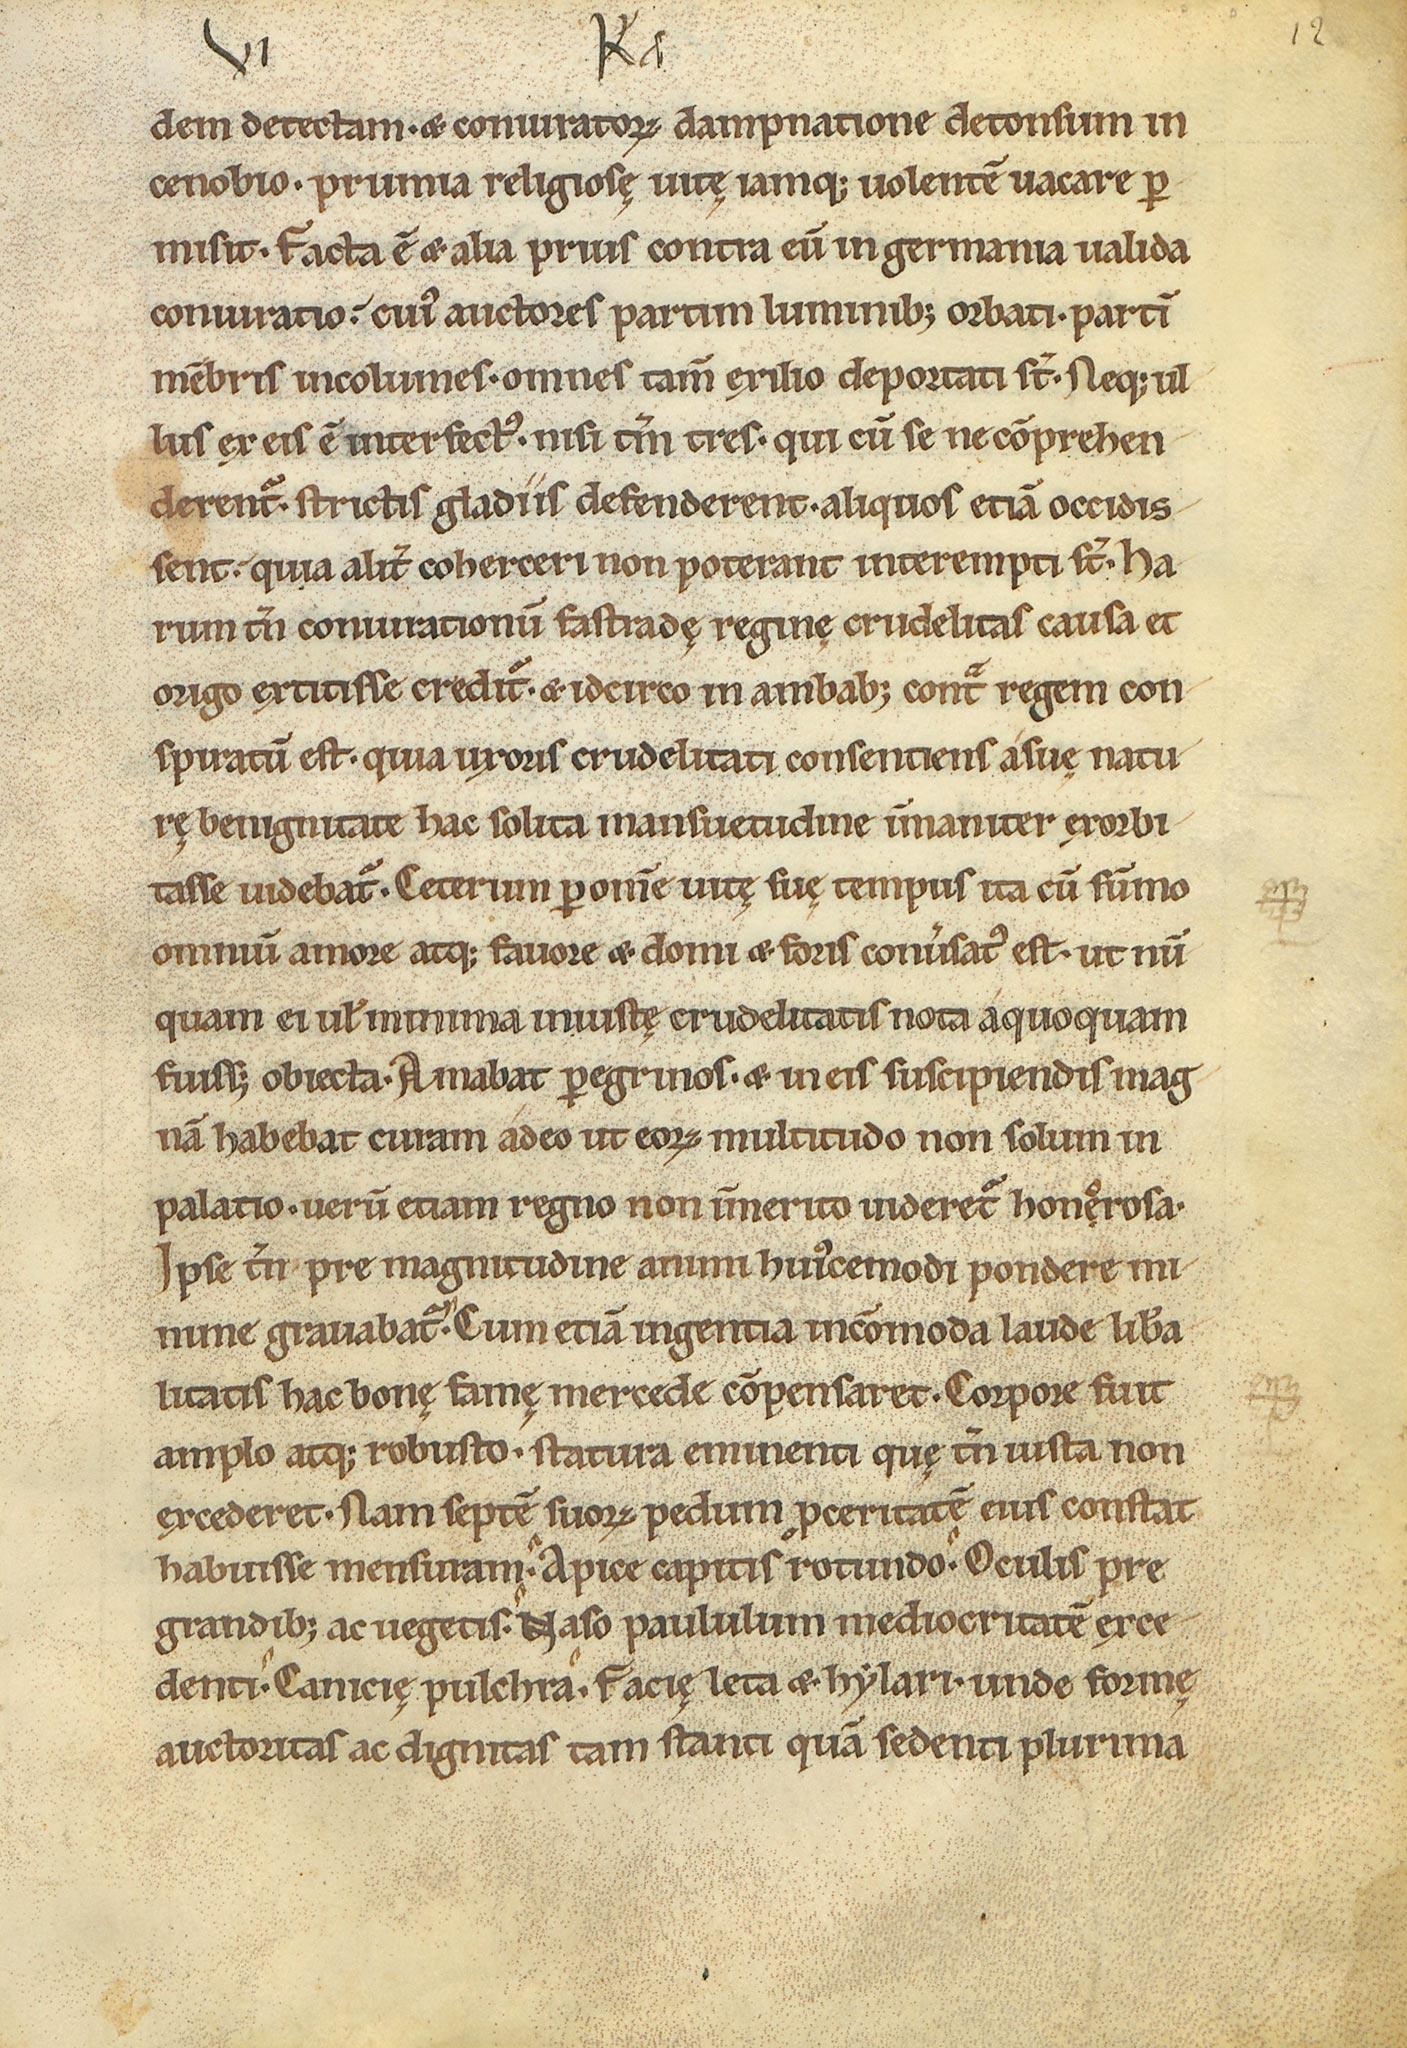 Manuscrit-Vita-Karoli-12r°